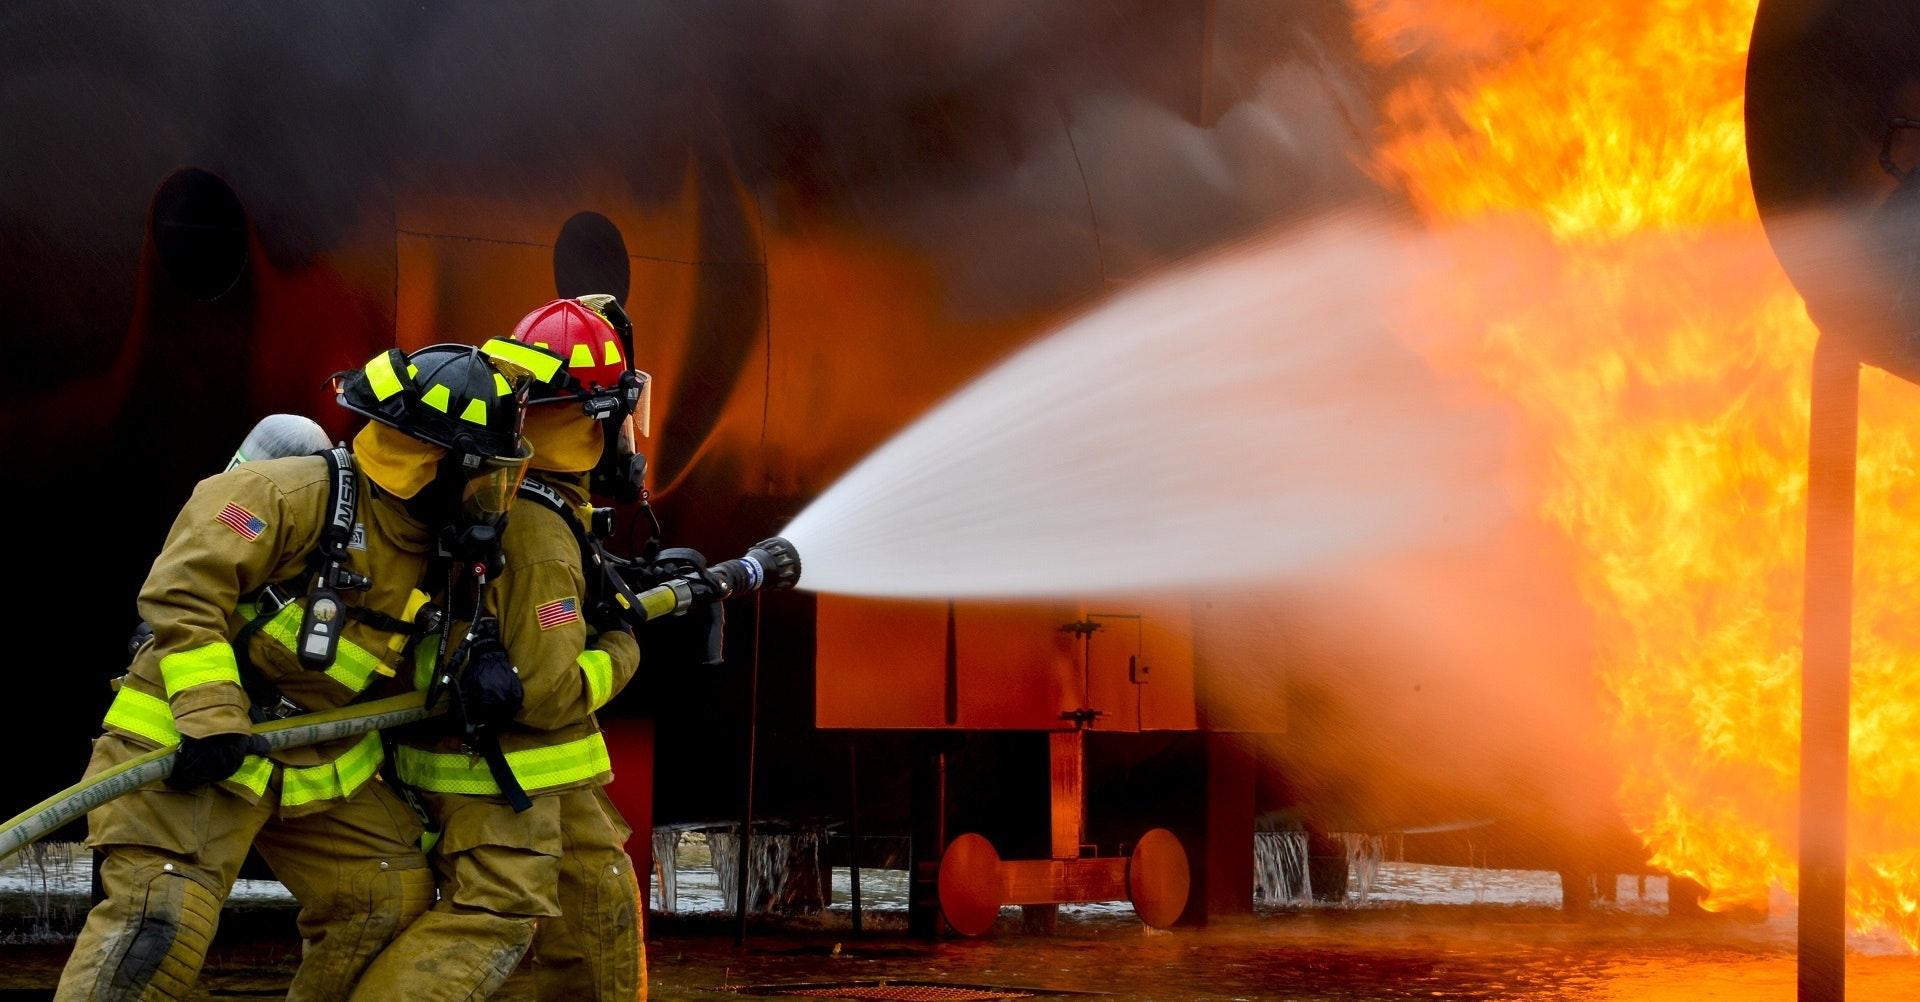 Fire Damage Restoration Services - Paul Davis Restoration of